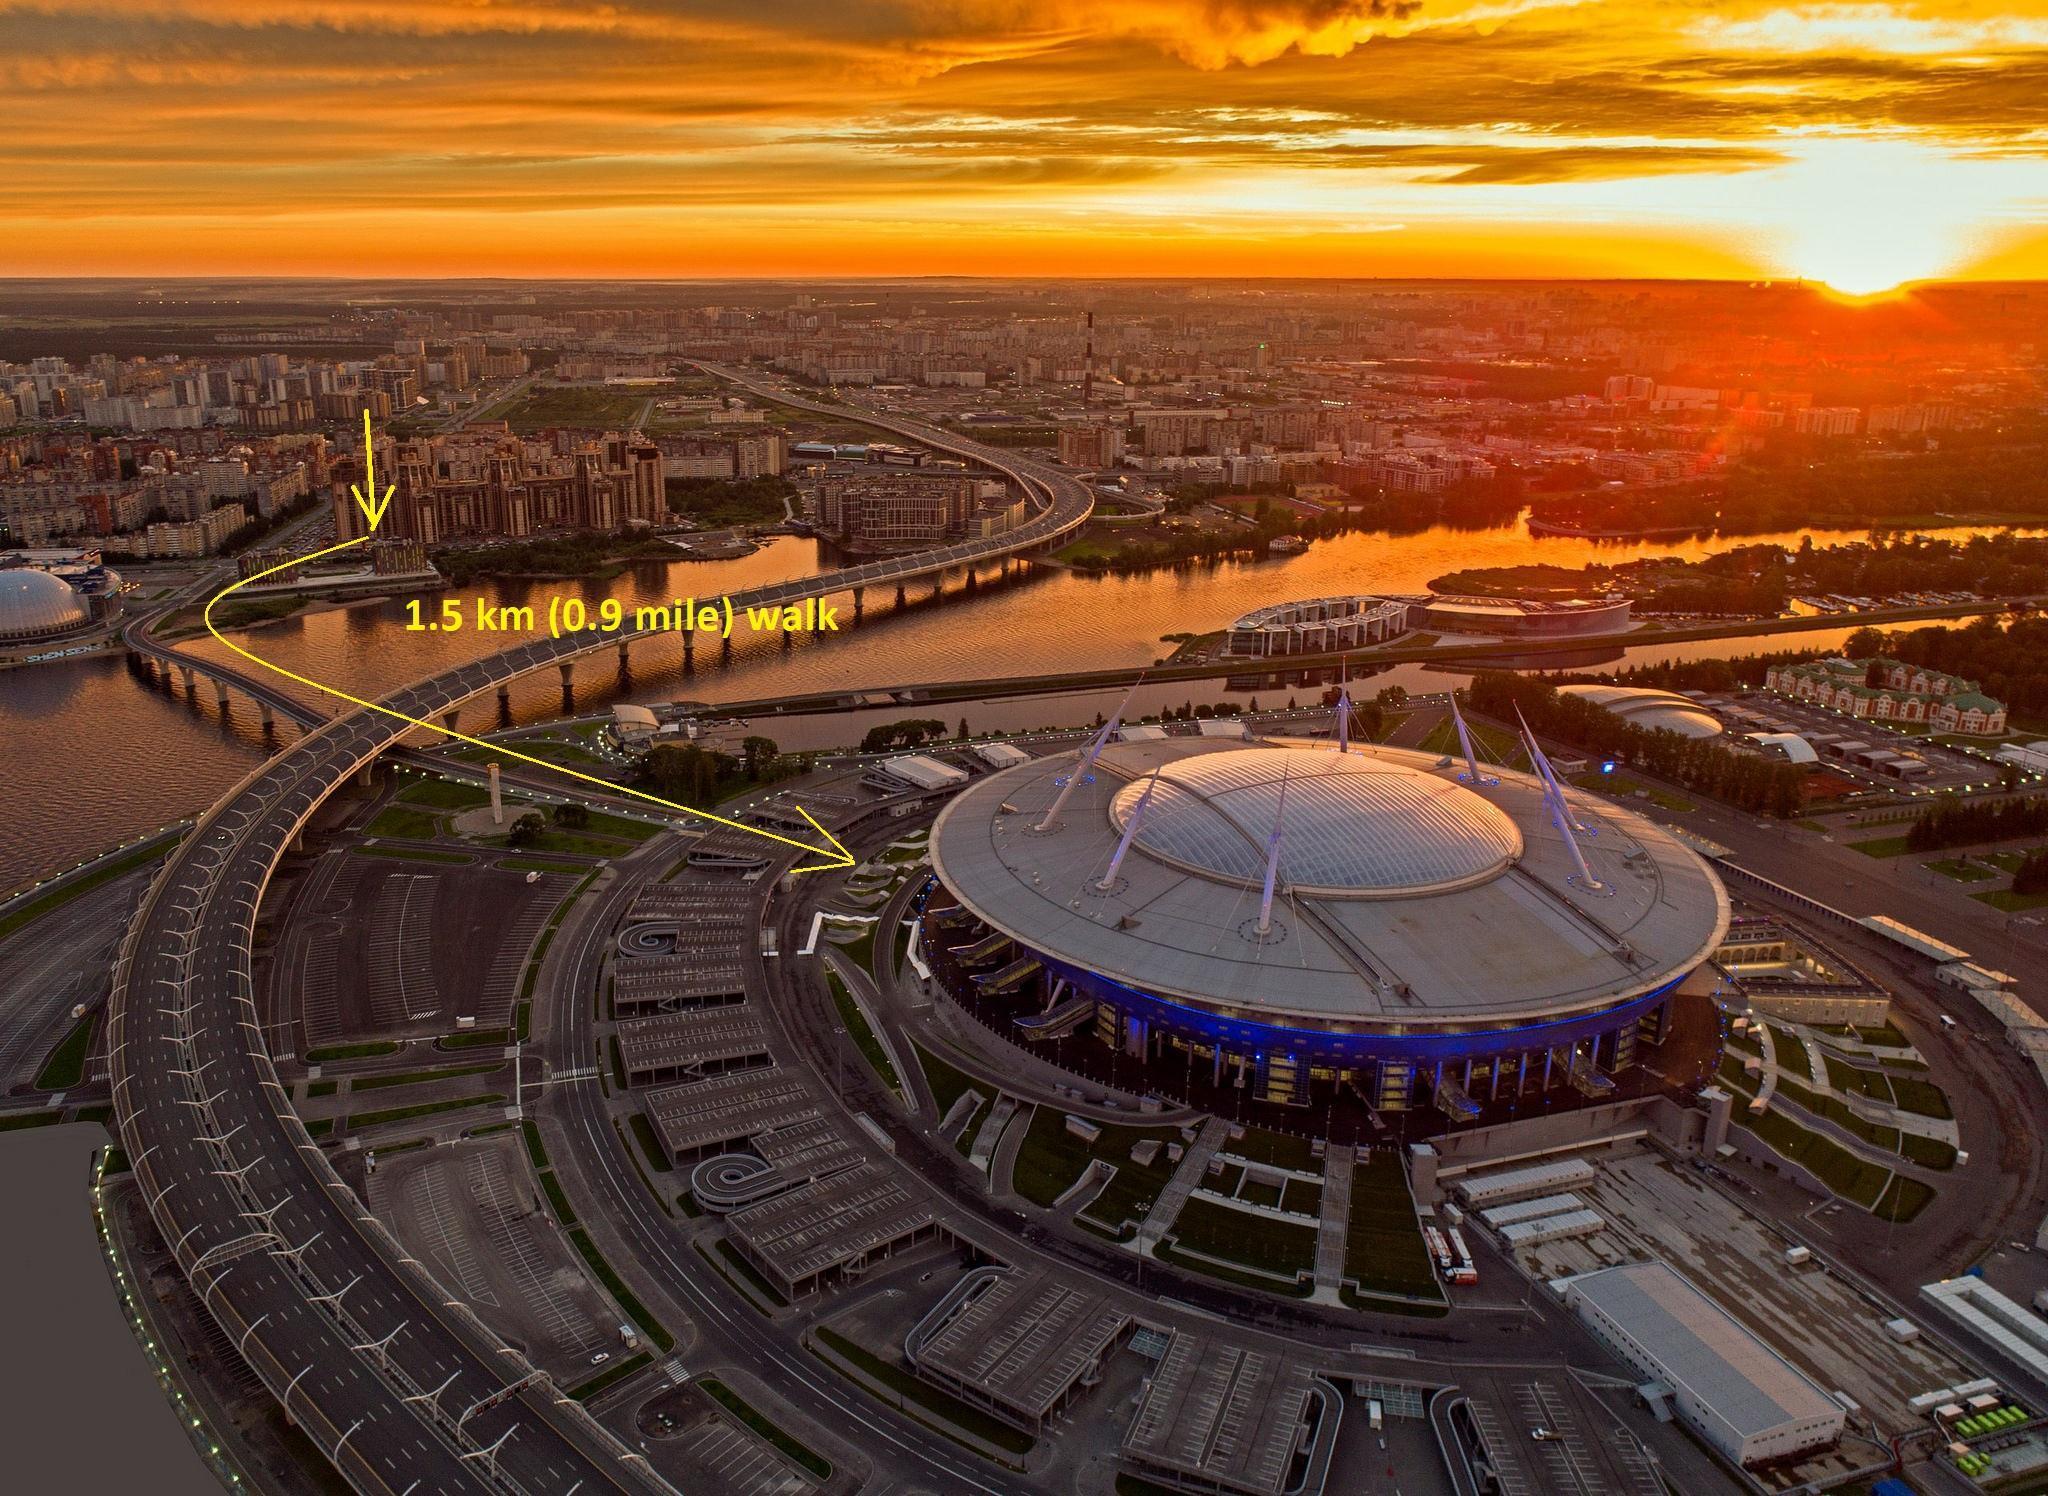 Stadium Saint Petersburg Zenit Arena Primorsky 137